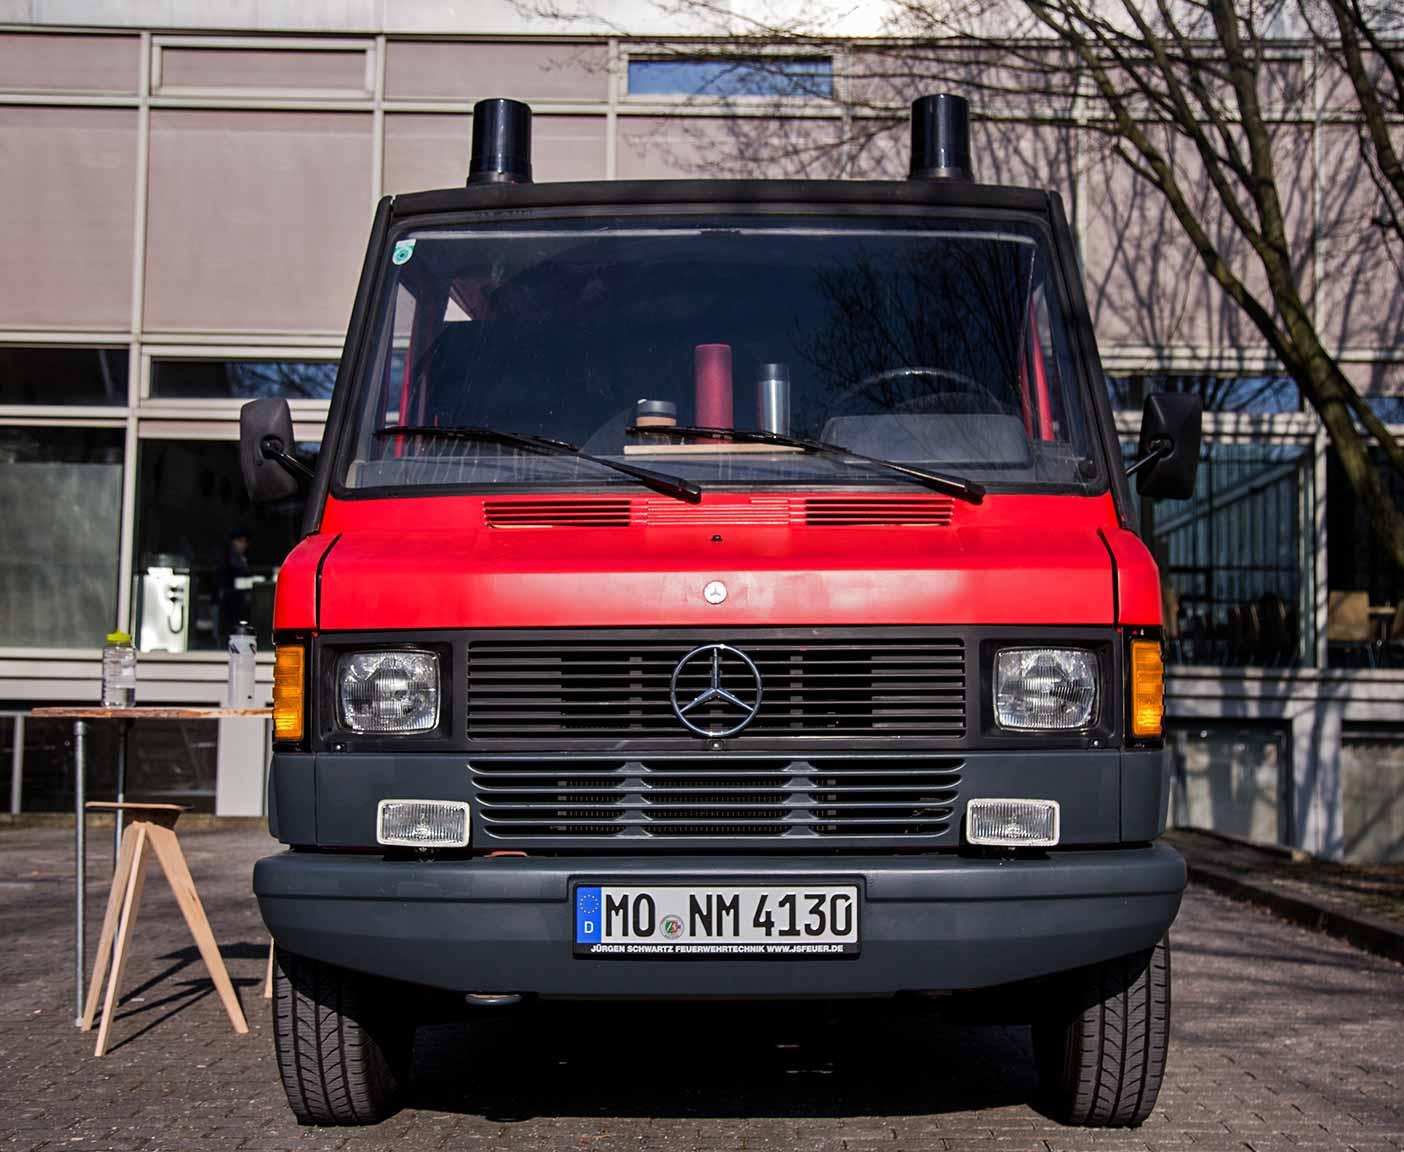 mercedes-310-benzin-4x4-zu-verkaufen-wohnmobil-technische-daten-allrad-d-10